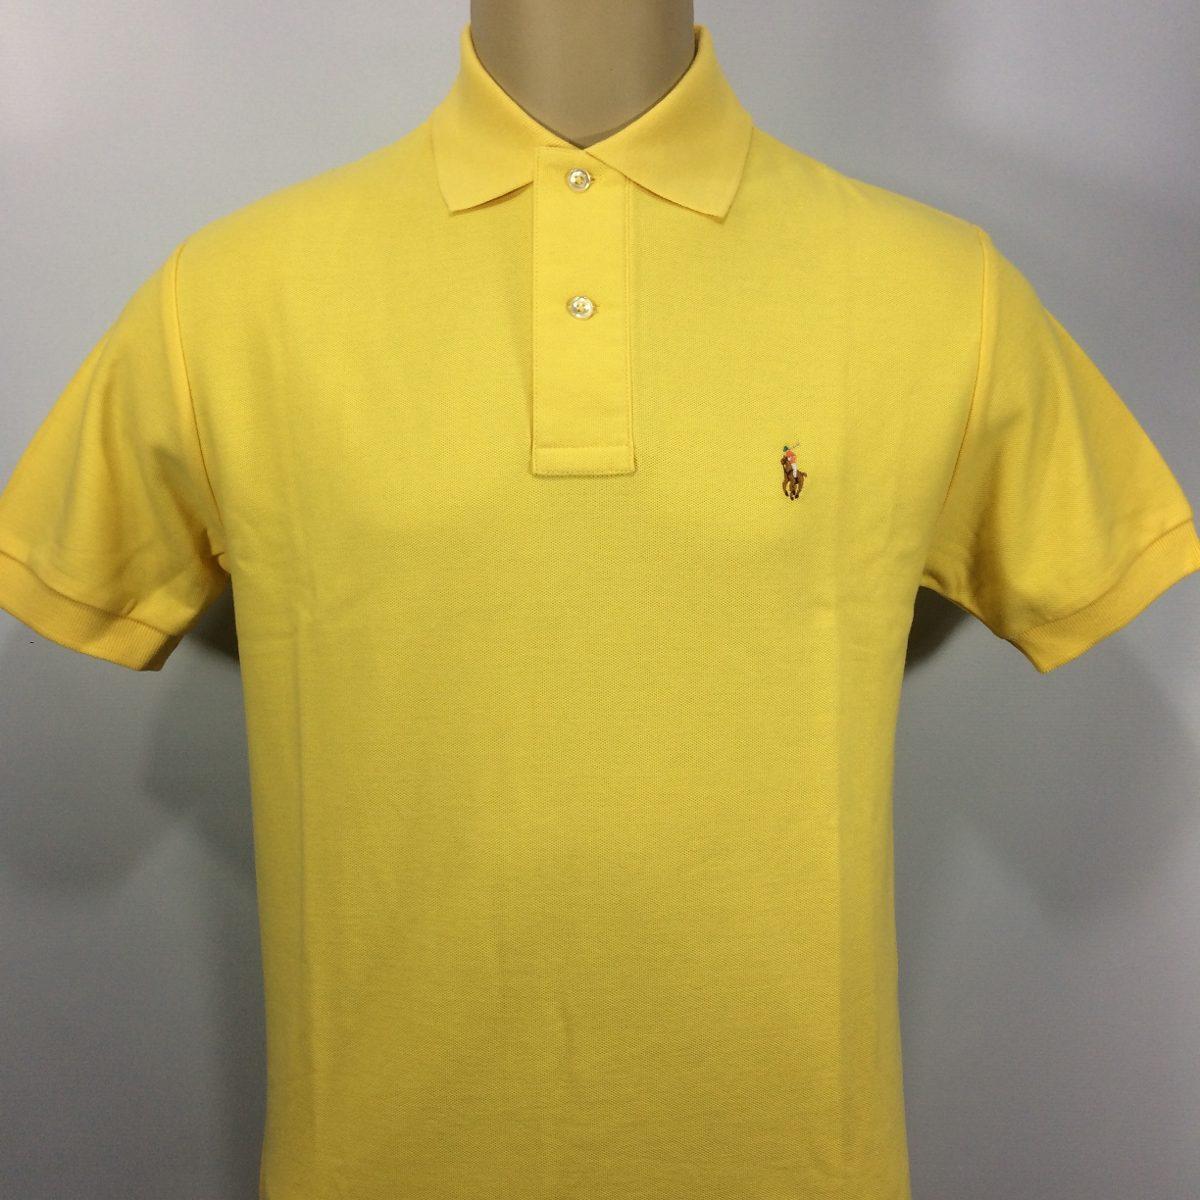 camisa polo ralph lauren slim fit cavalo colorido. Carregando zoom. bb5a510a1be